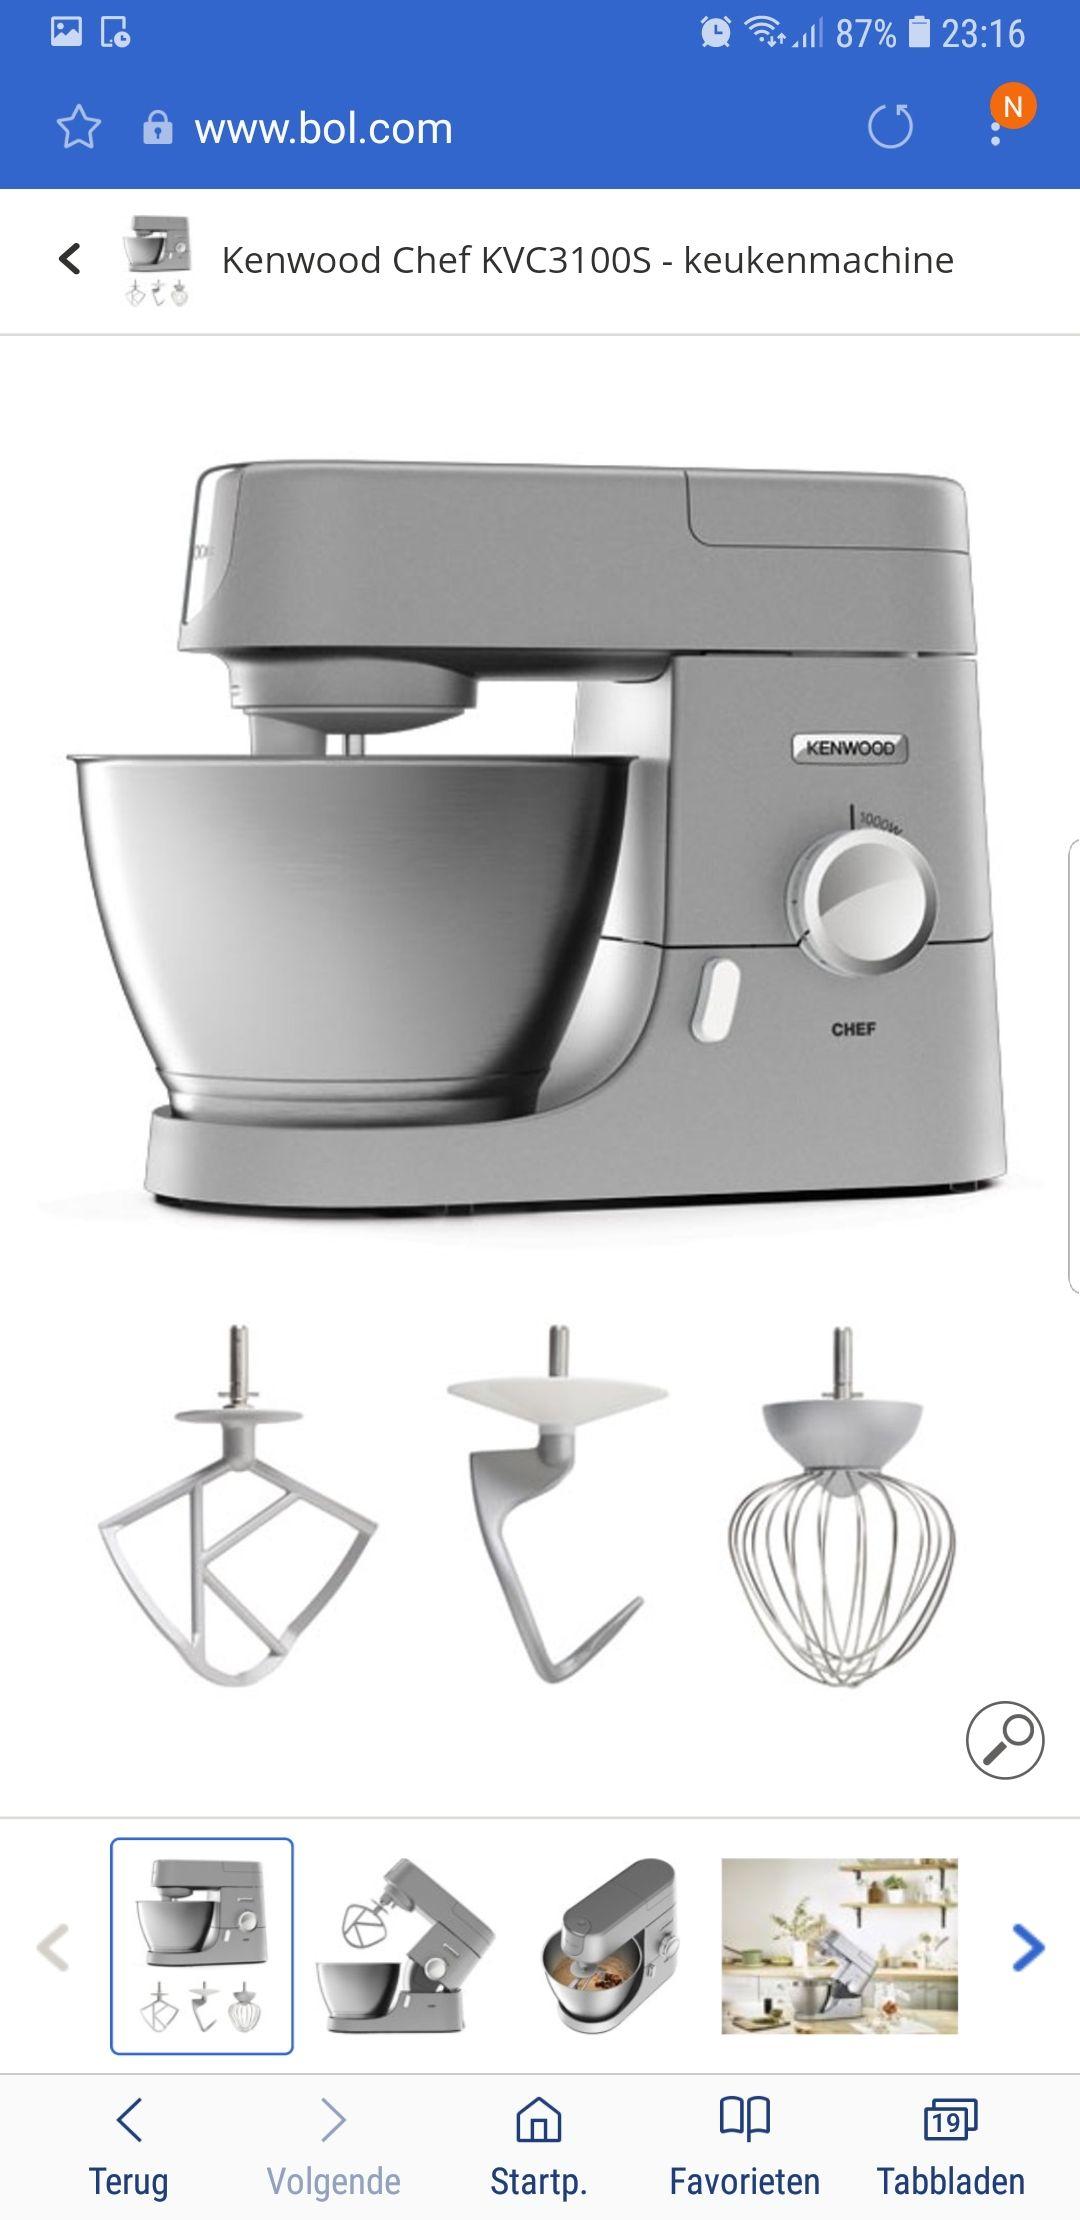 Kenwood Chef KVC3100S - keukenmachine elders vanaf €285e